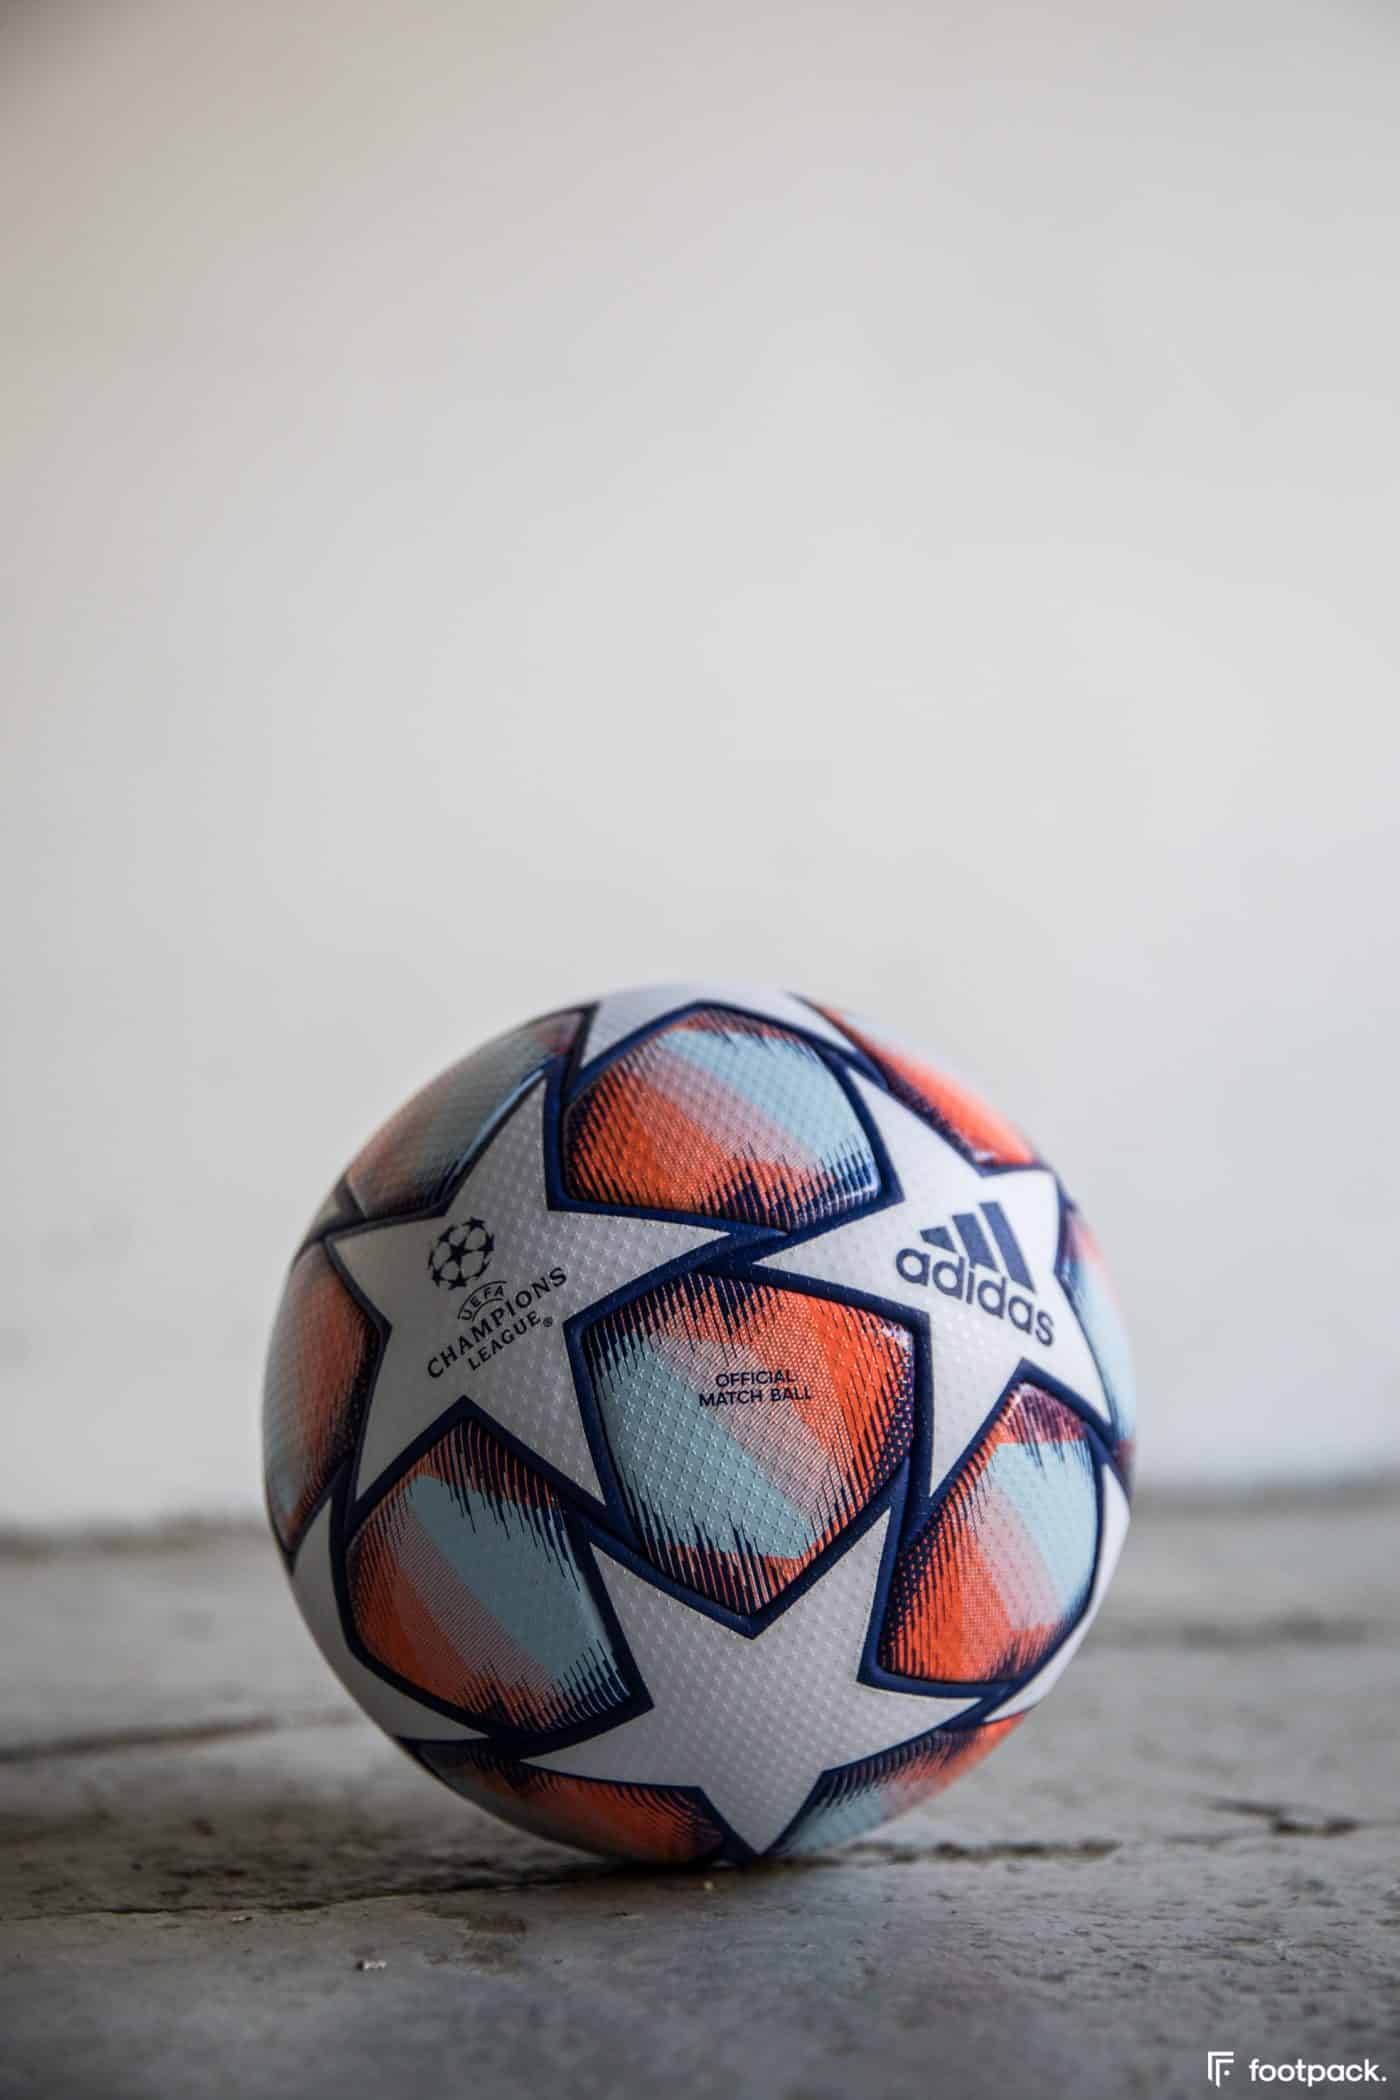 ballon-champions-league-2020-2021-adidas-footpack-2